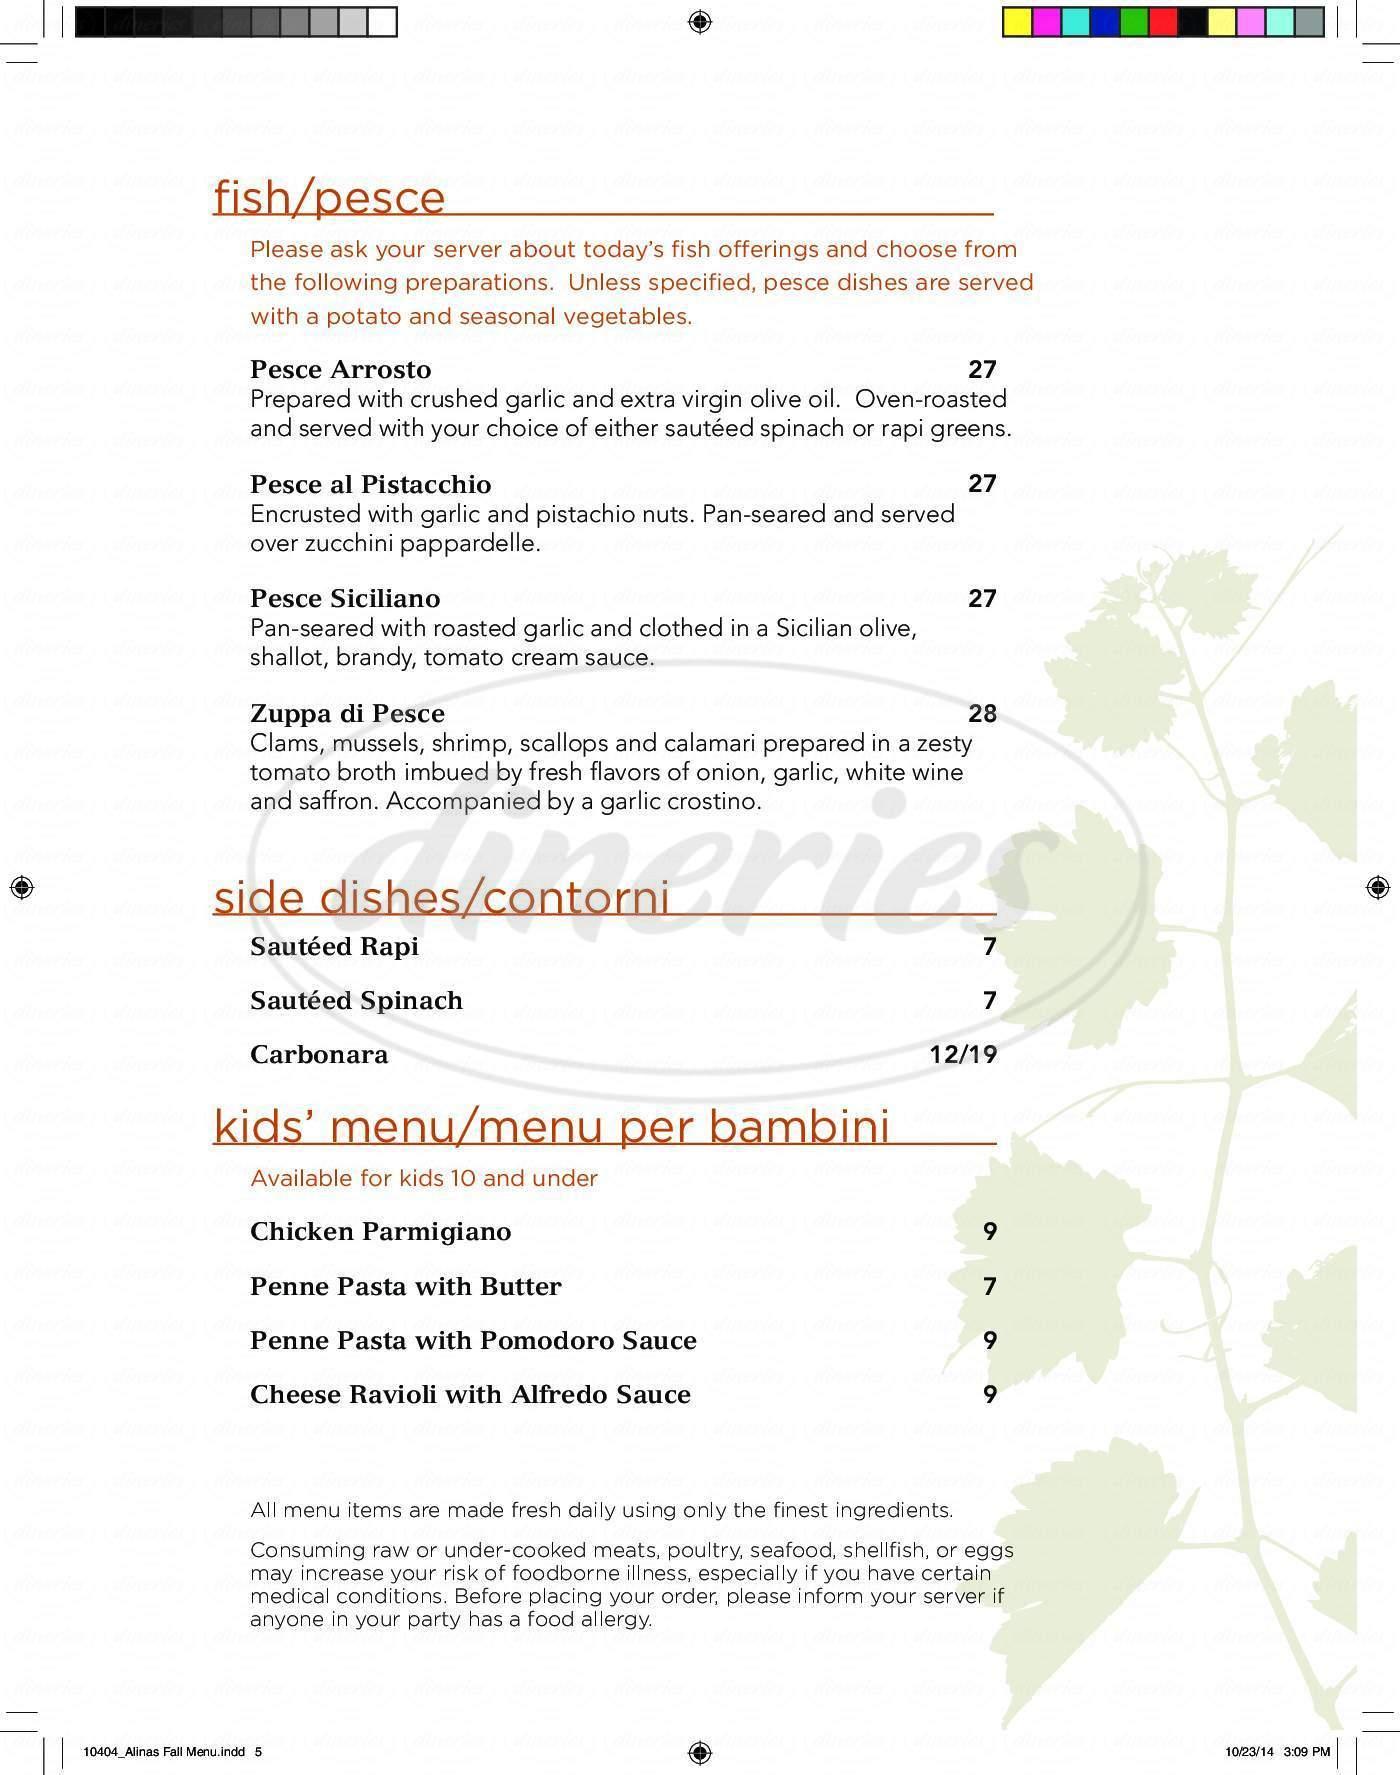 menu for Alina's Ristorante